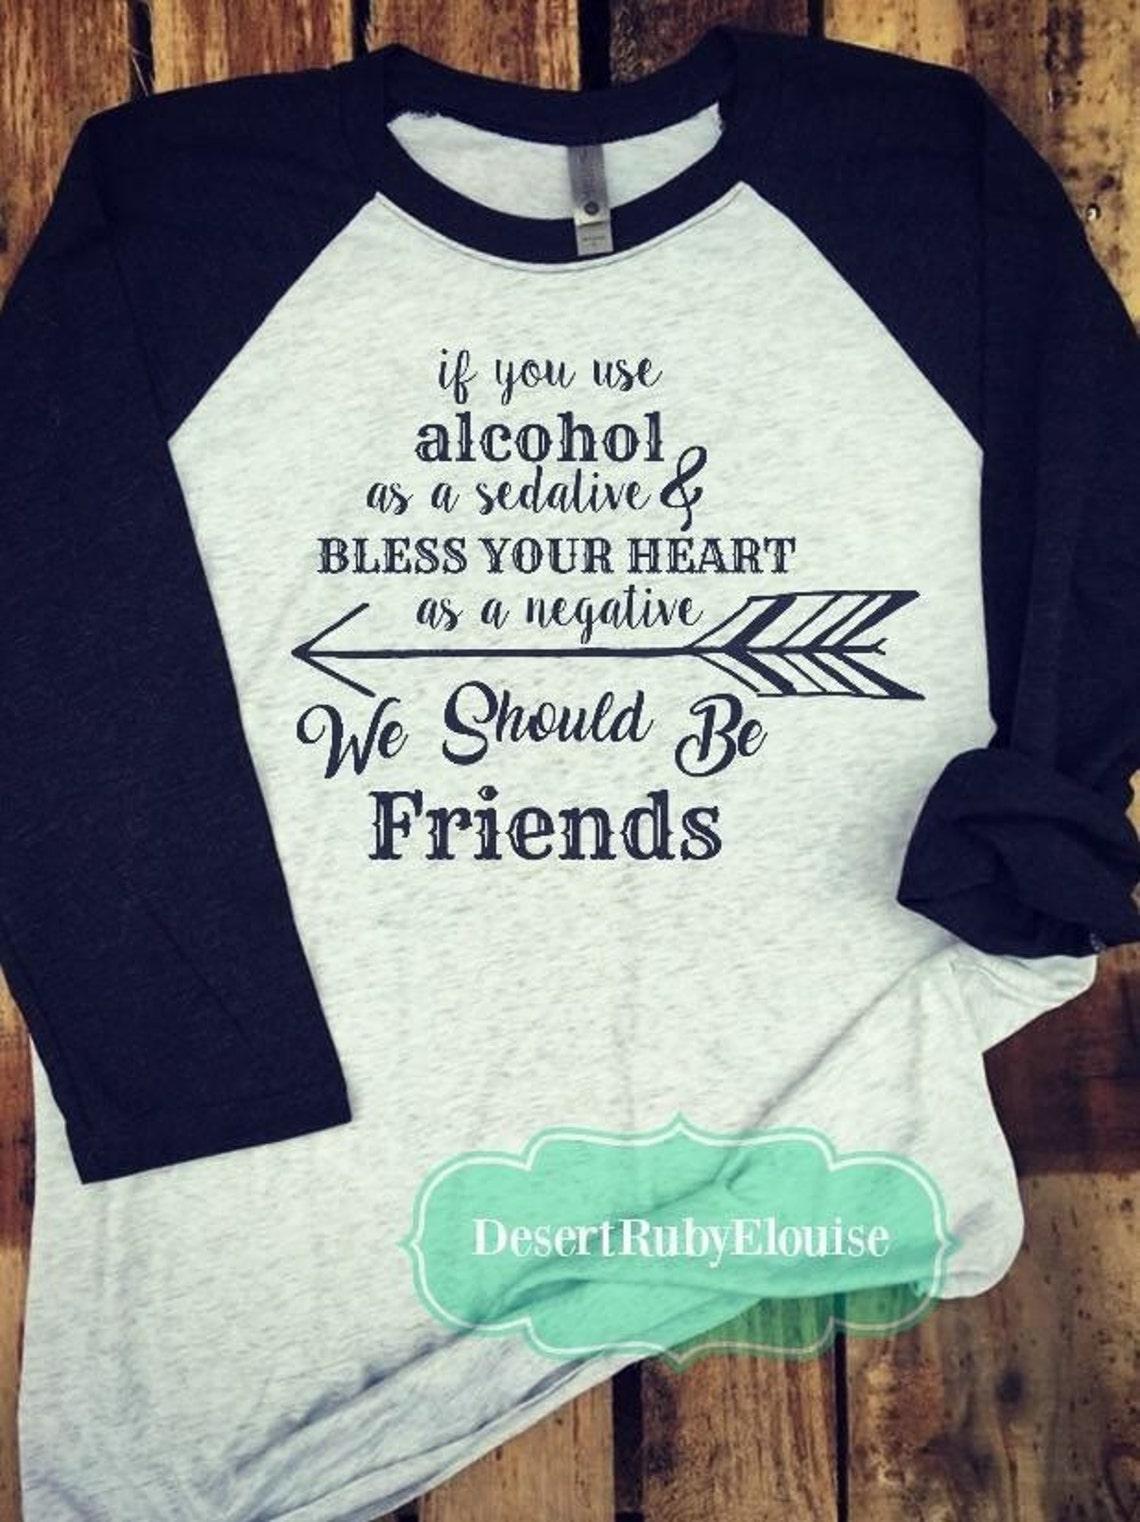 We Should Be Friends Lambert Song Lyrics Bless Your Heart Etsy